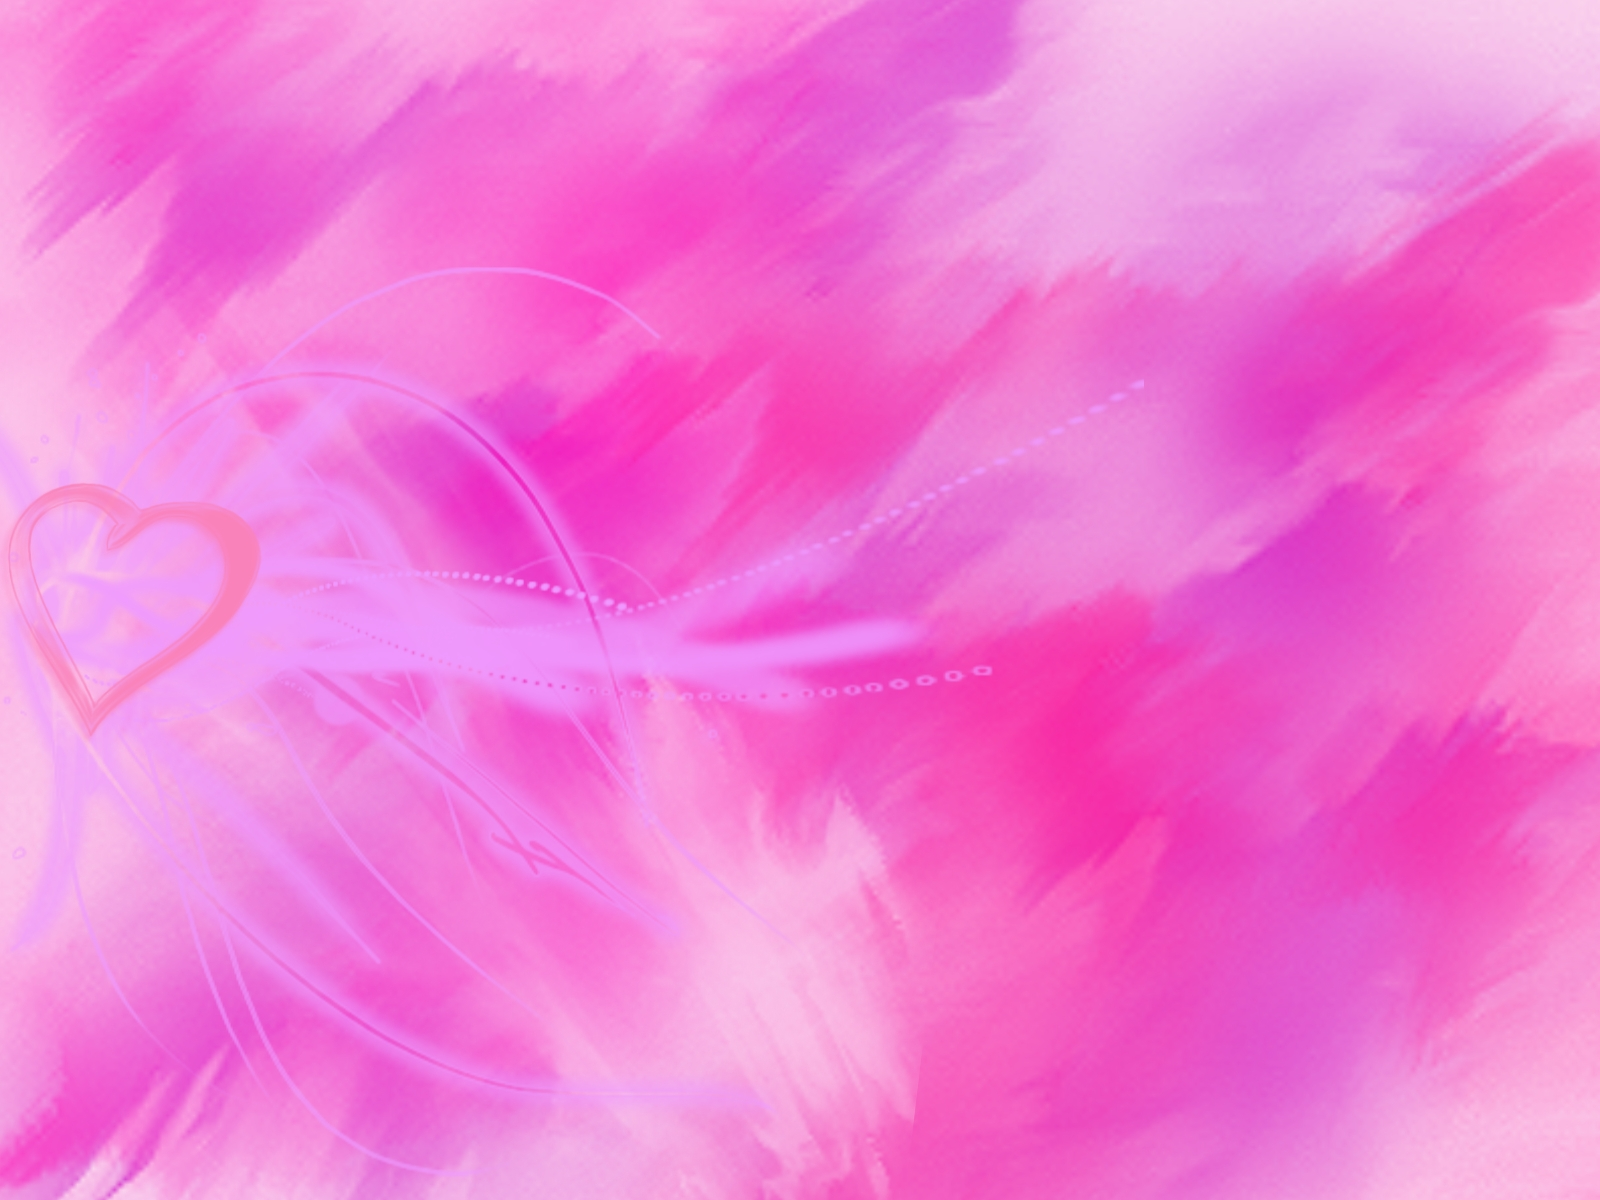 Pink Pretty Backgrounds - WallpaperSafari